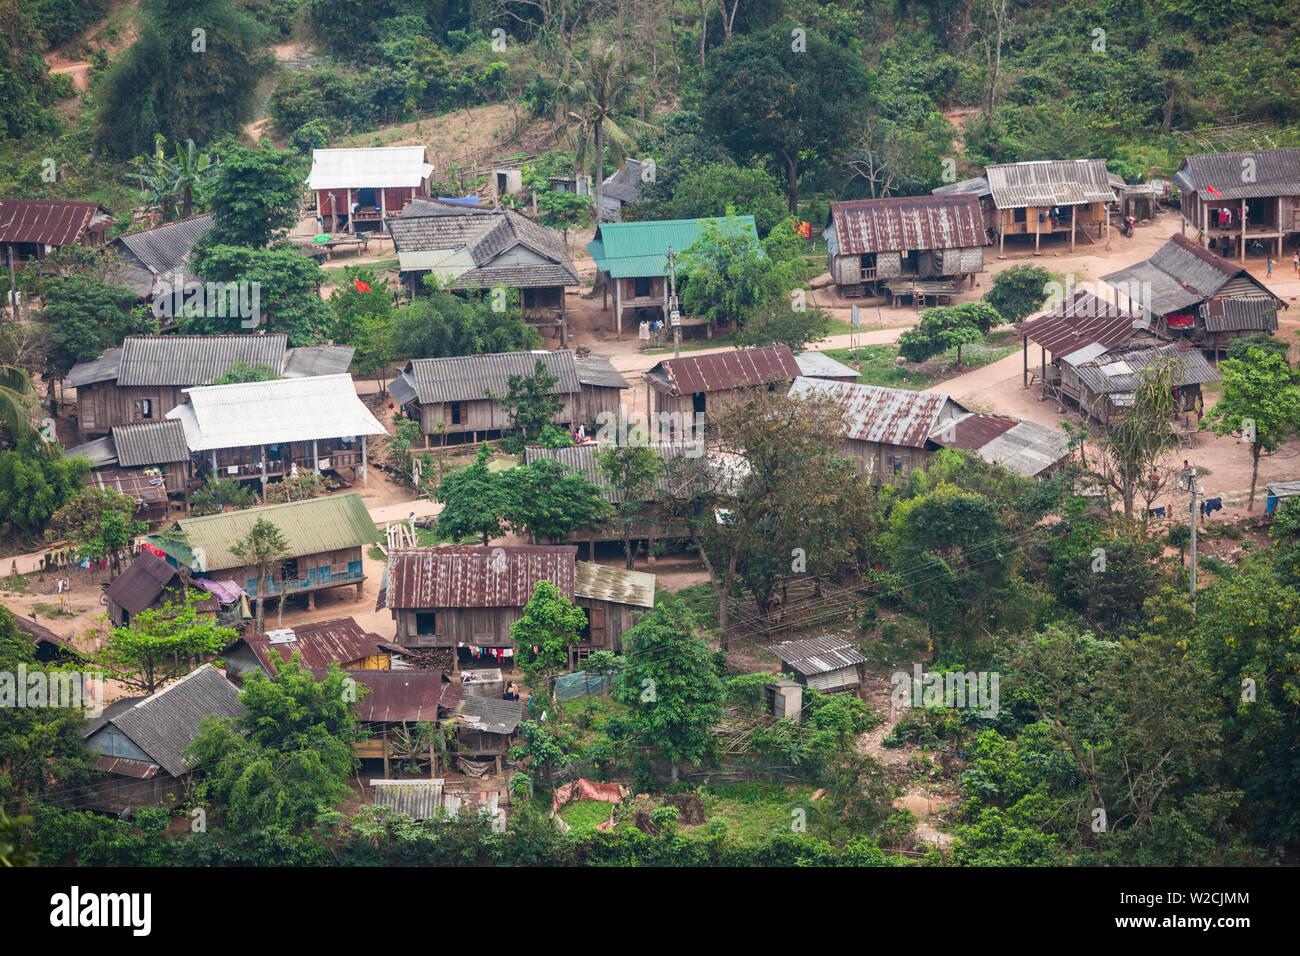 Vietnam, DMZ, Provinz Quang Tri, Cua Tal, Erhöhte Ansicht der indigenen Montagnard Menschen Dorf Stockbild